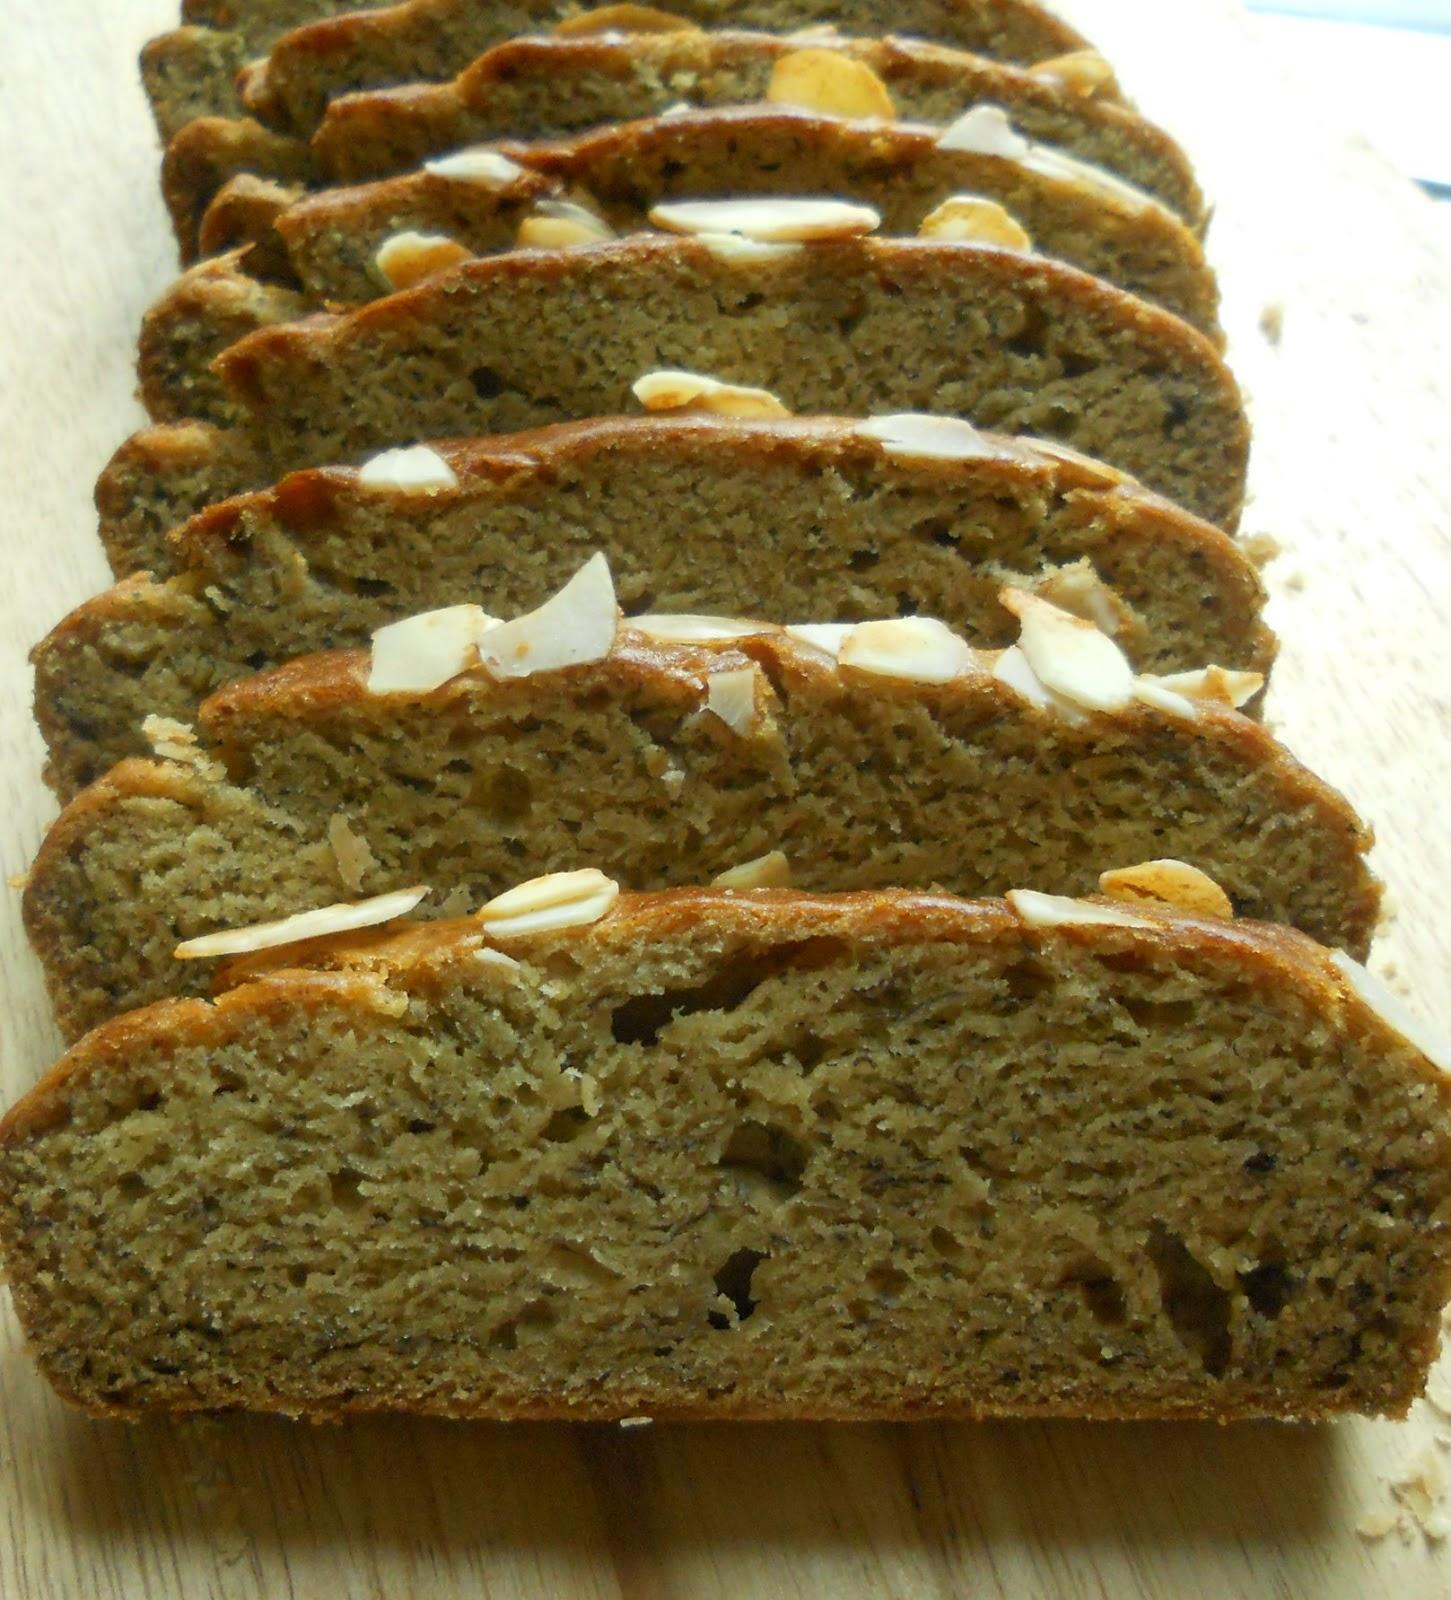 http://4.bp.blogspot.com/-Wk-BL6bbSRc/T5Z7MXZUA1I/AAAAAAAAAyc/Q8E506kGtQw/s1600/food+2012+162.jpg